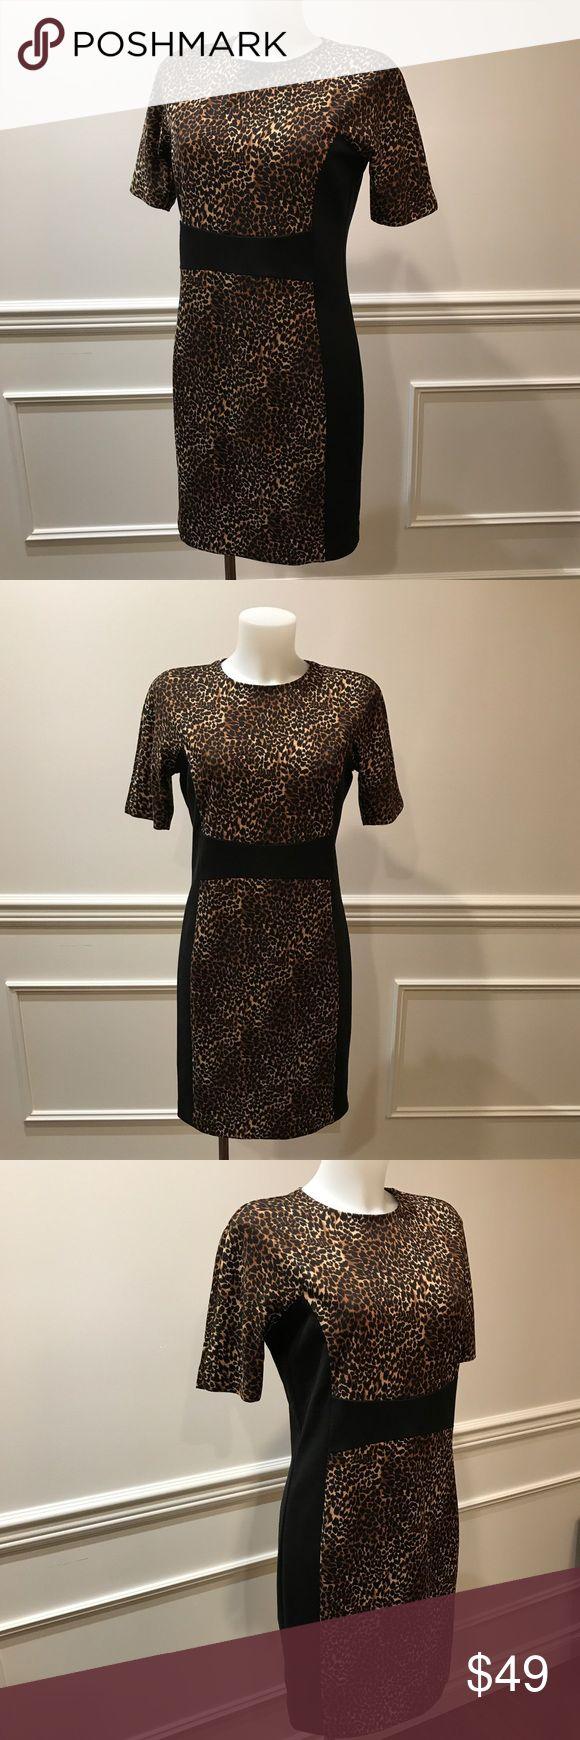 Animal print Michael Kors mini dress. Classic animal print Michael Kors  zip up the back mini dress. MICHAEL Michael Kors Dresses Mini